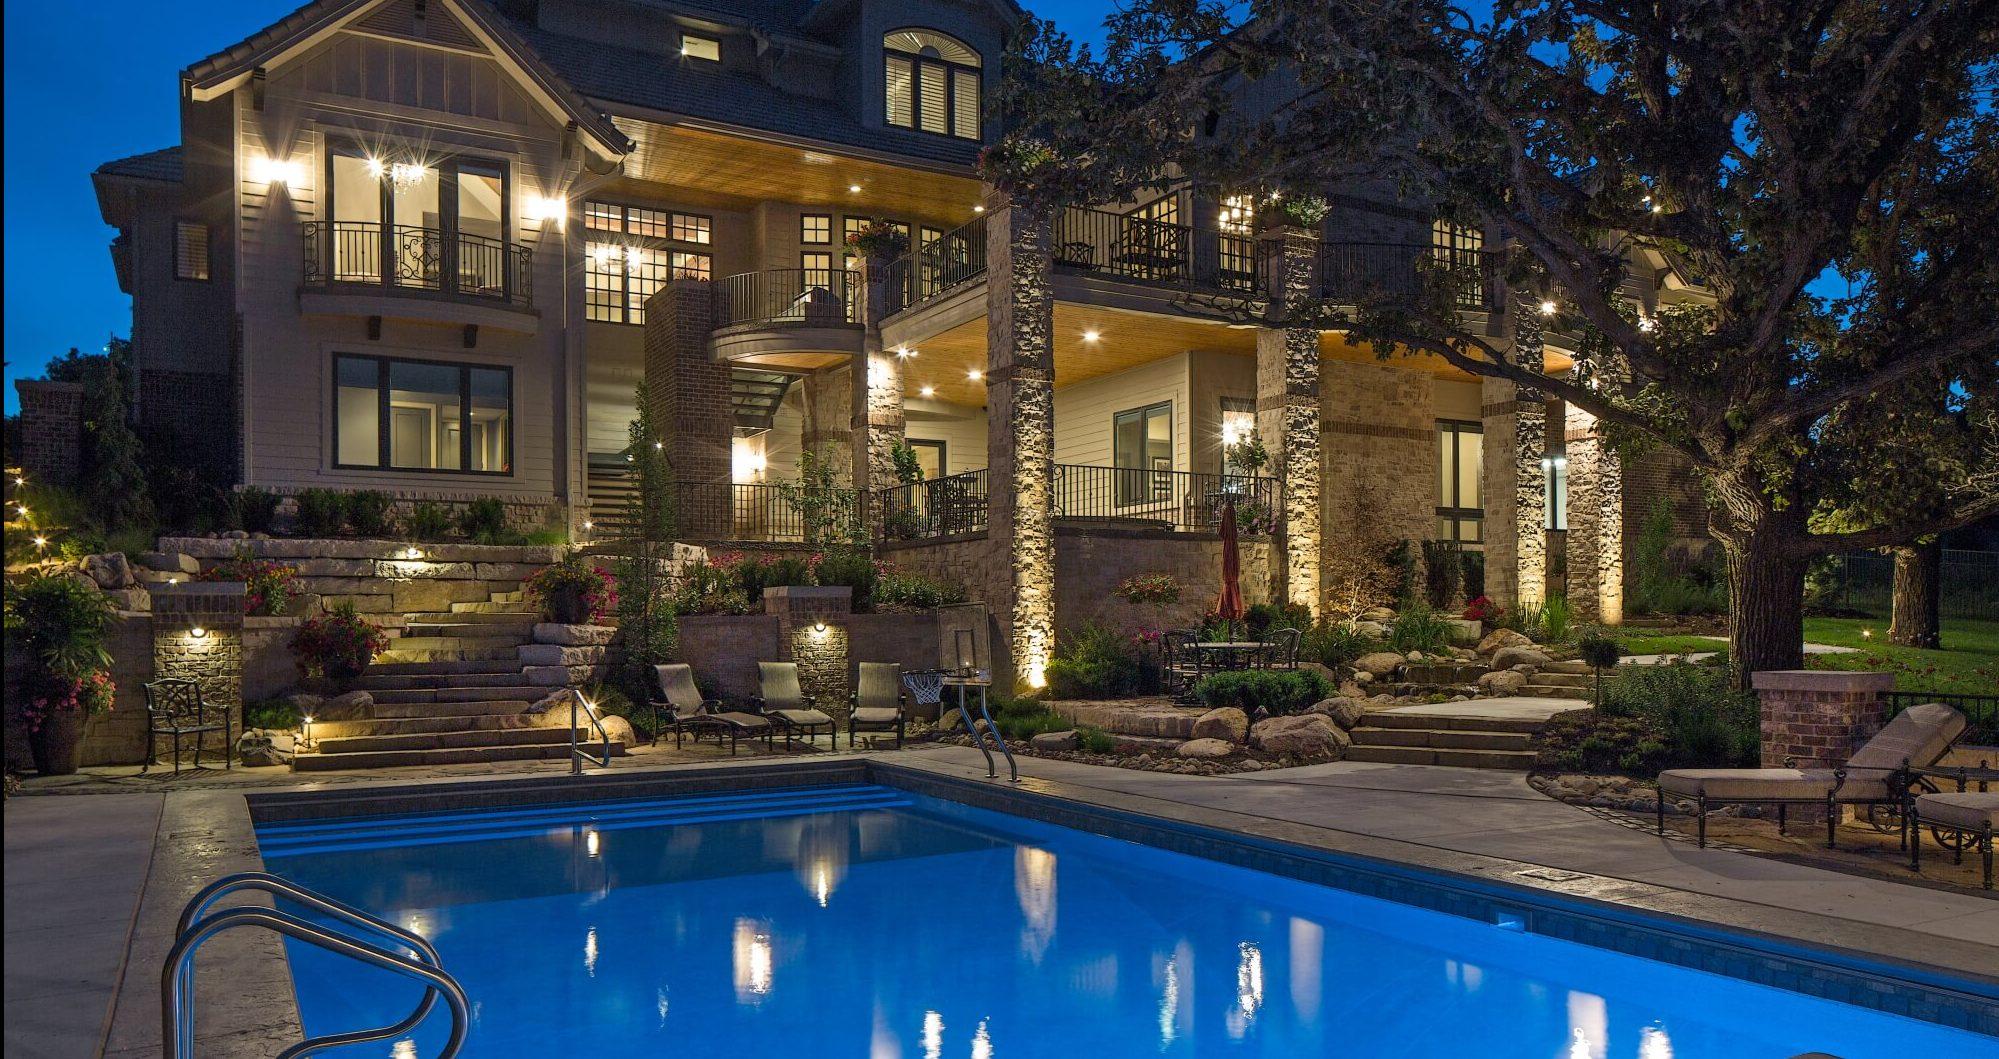 100 Home Lighting Design Images